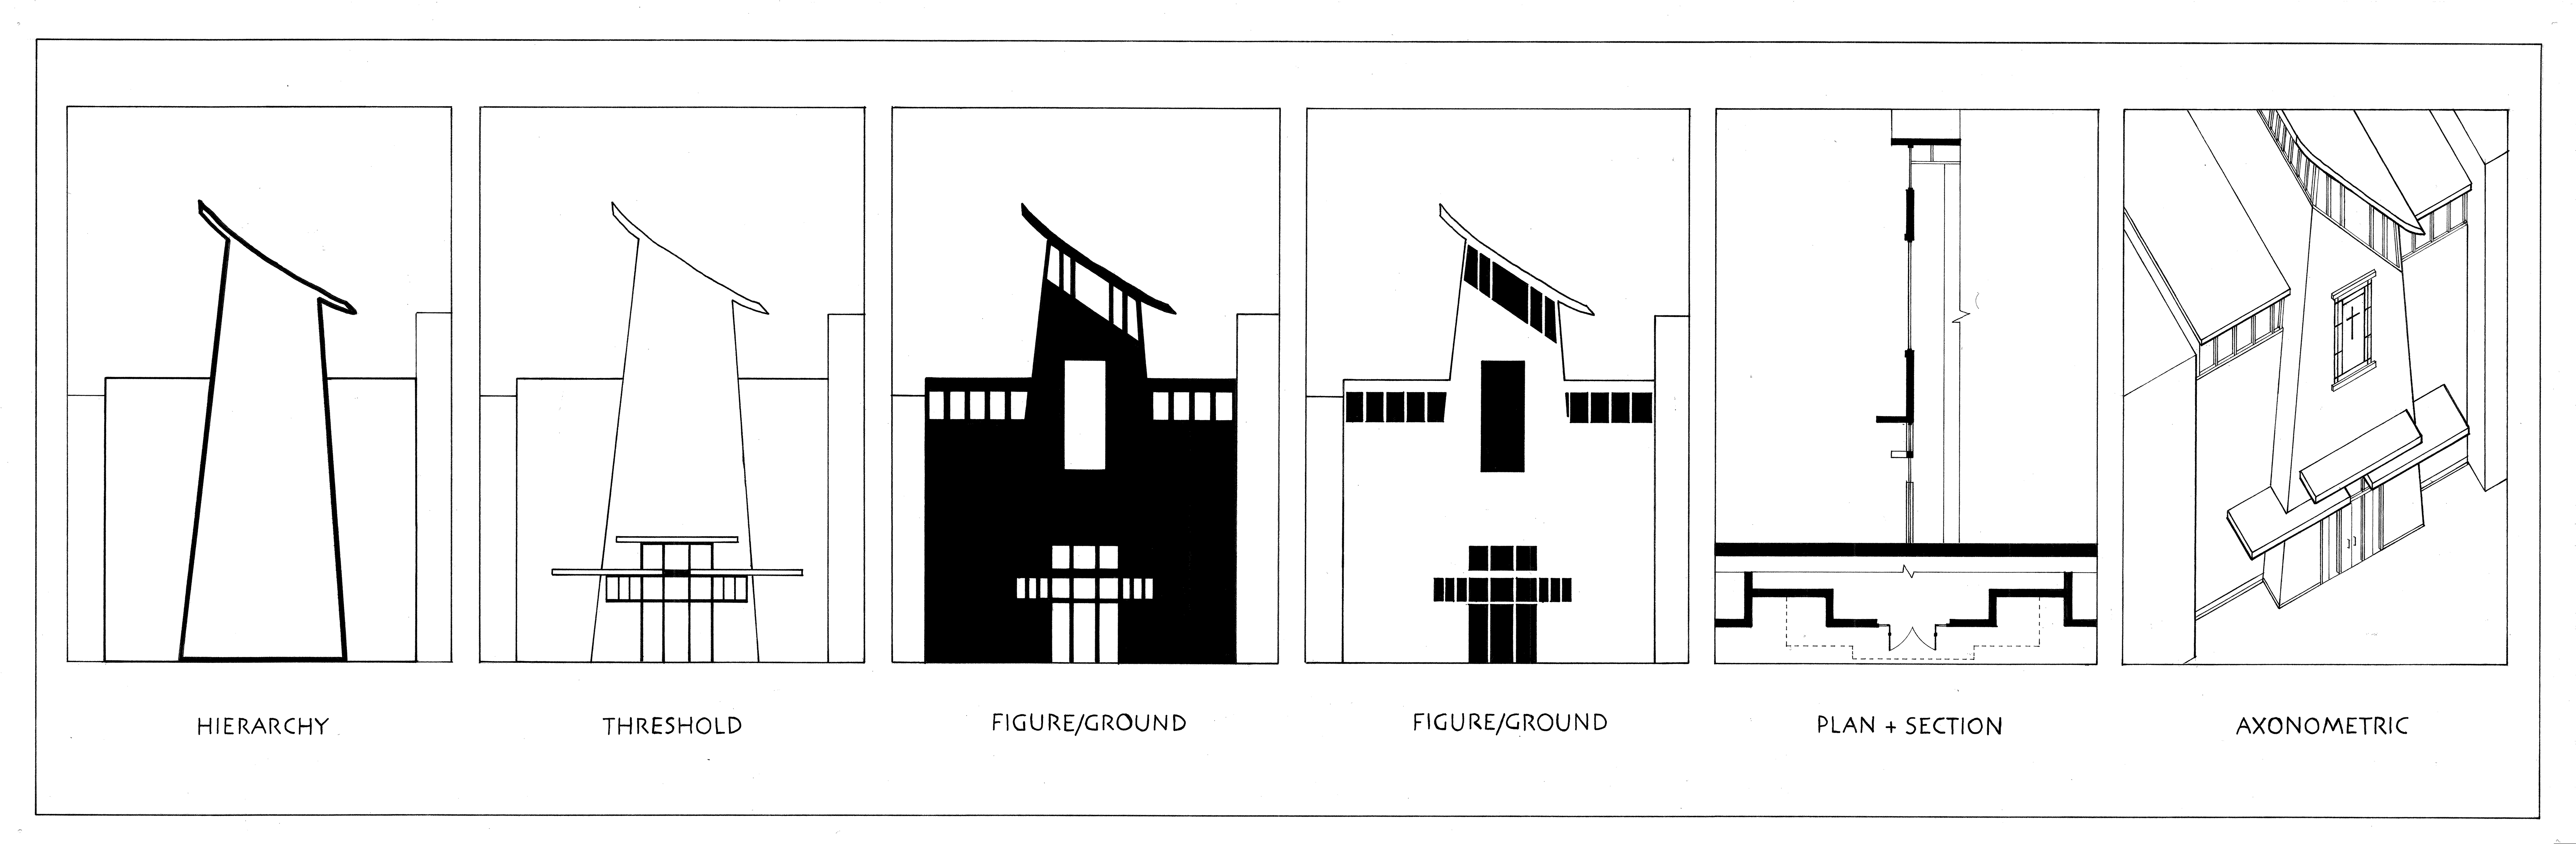 Facade project diagrams